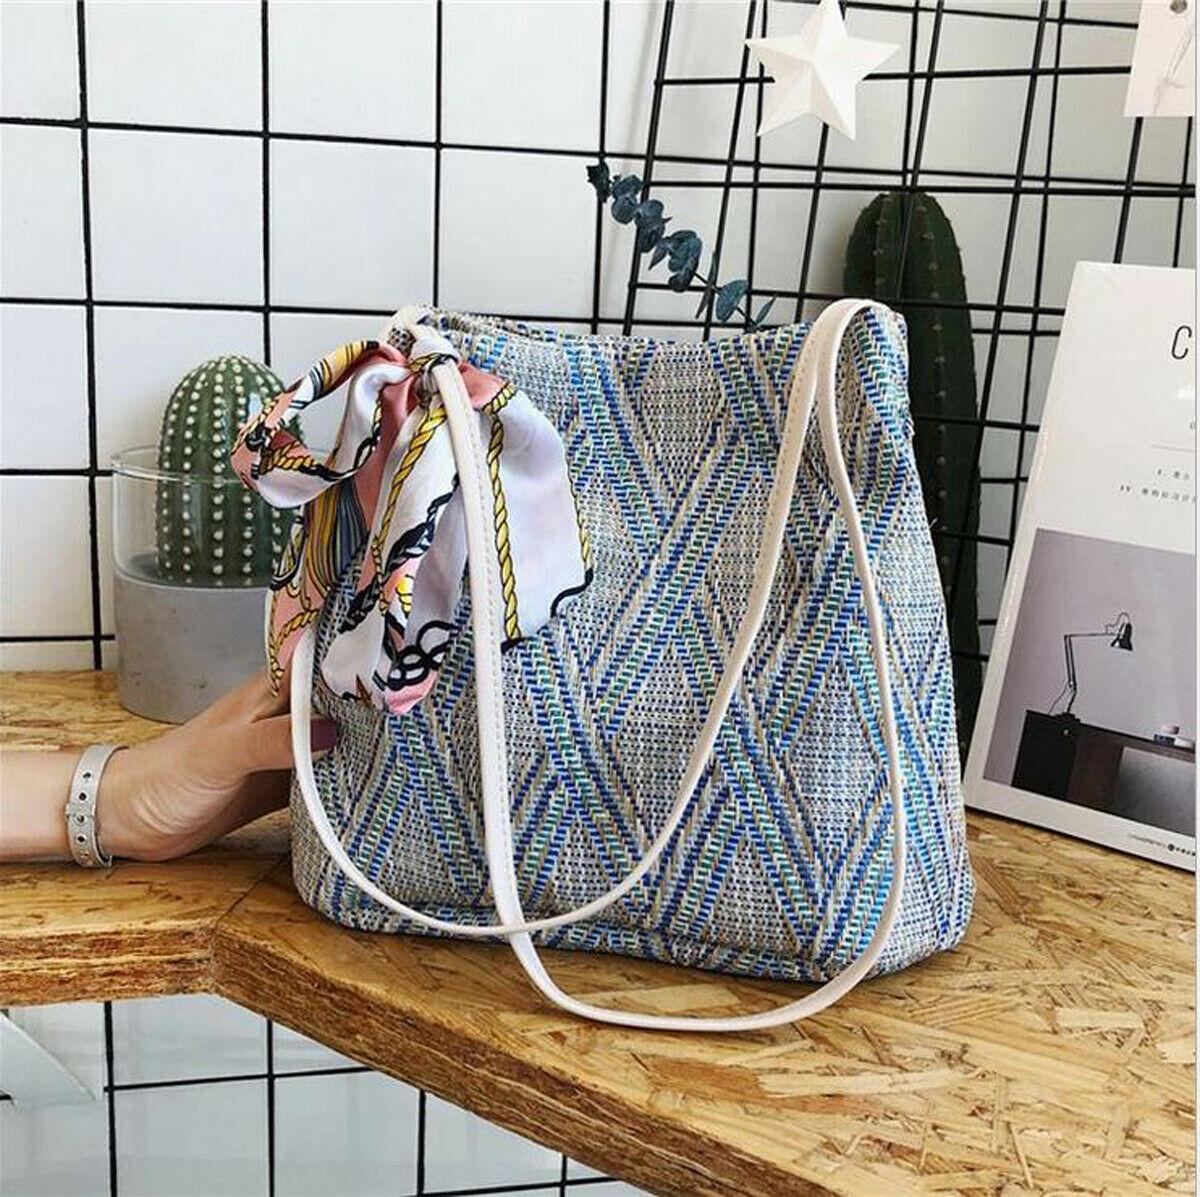 Straw Woven Bag Handmade Rattan Woven Vintage Retro Straw Rope Knitted Women Crossbody Handbag Summer Beach Bag